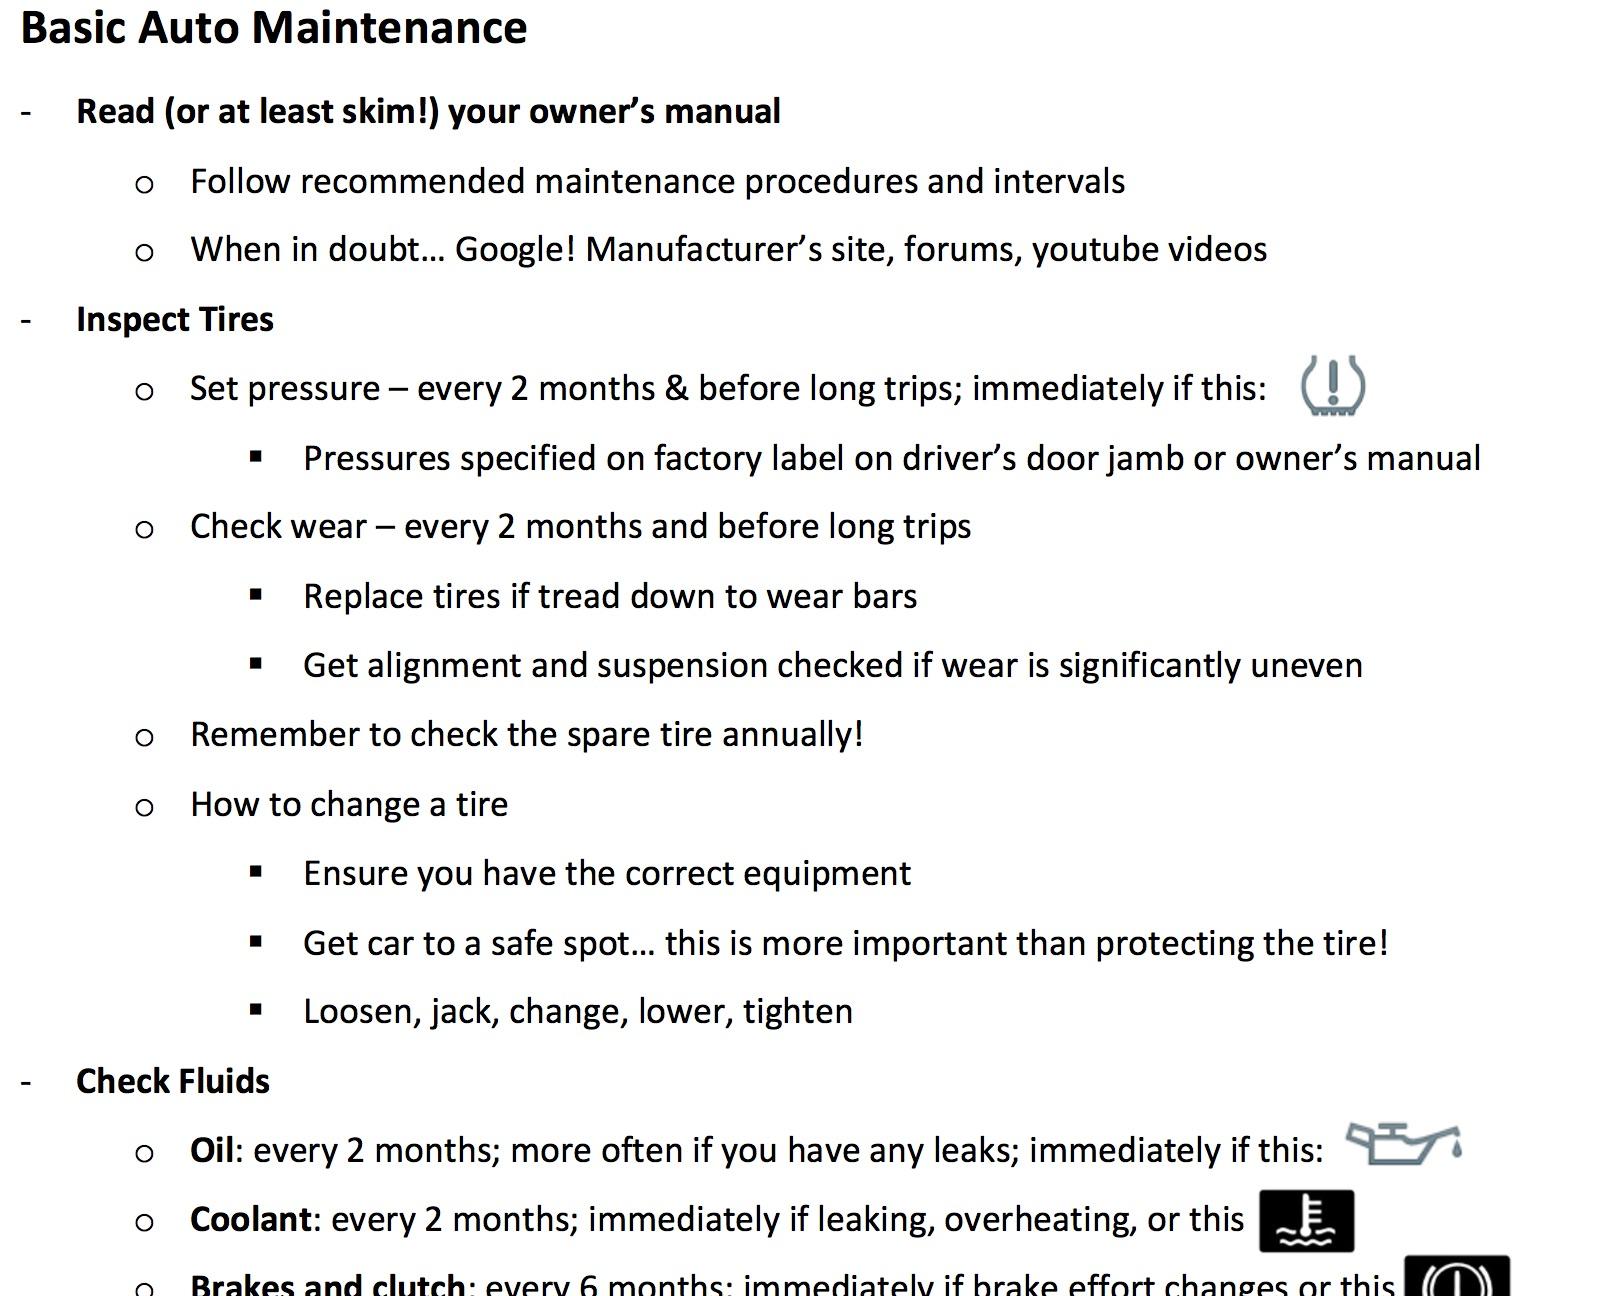 Basic_Auto_Maintenance__page_1_of_2_.jpg